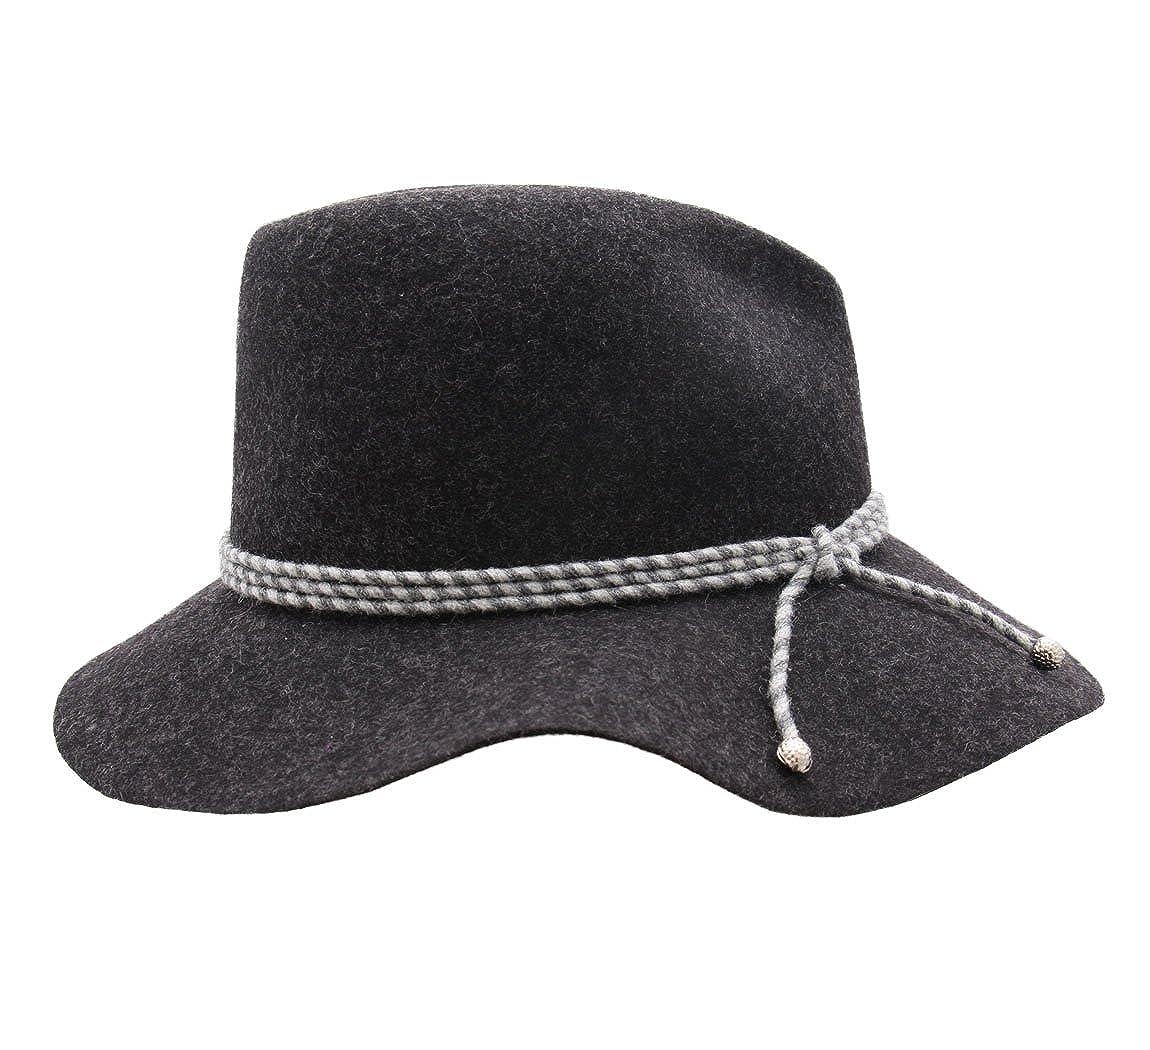 Marzi Womens H/él/ène Wool Felt Fedora Hat Packable